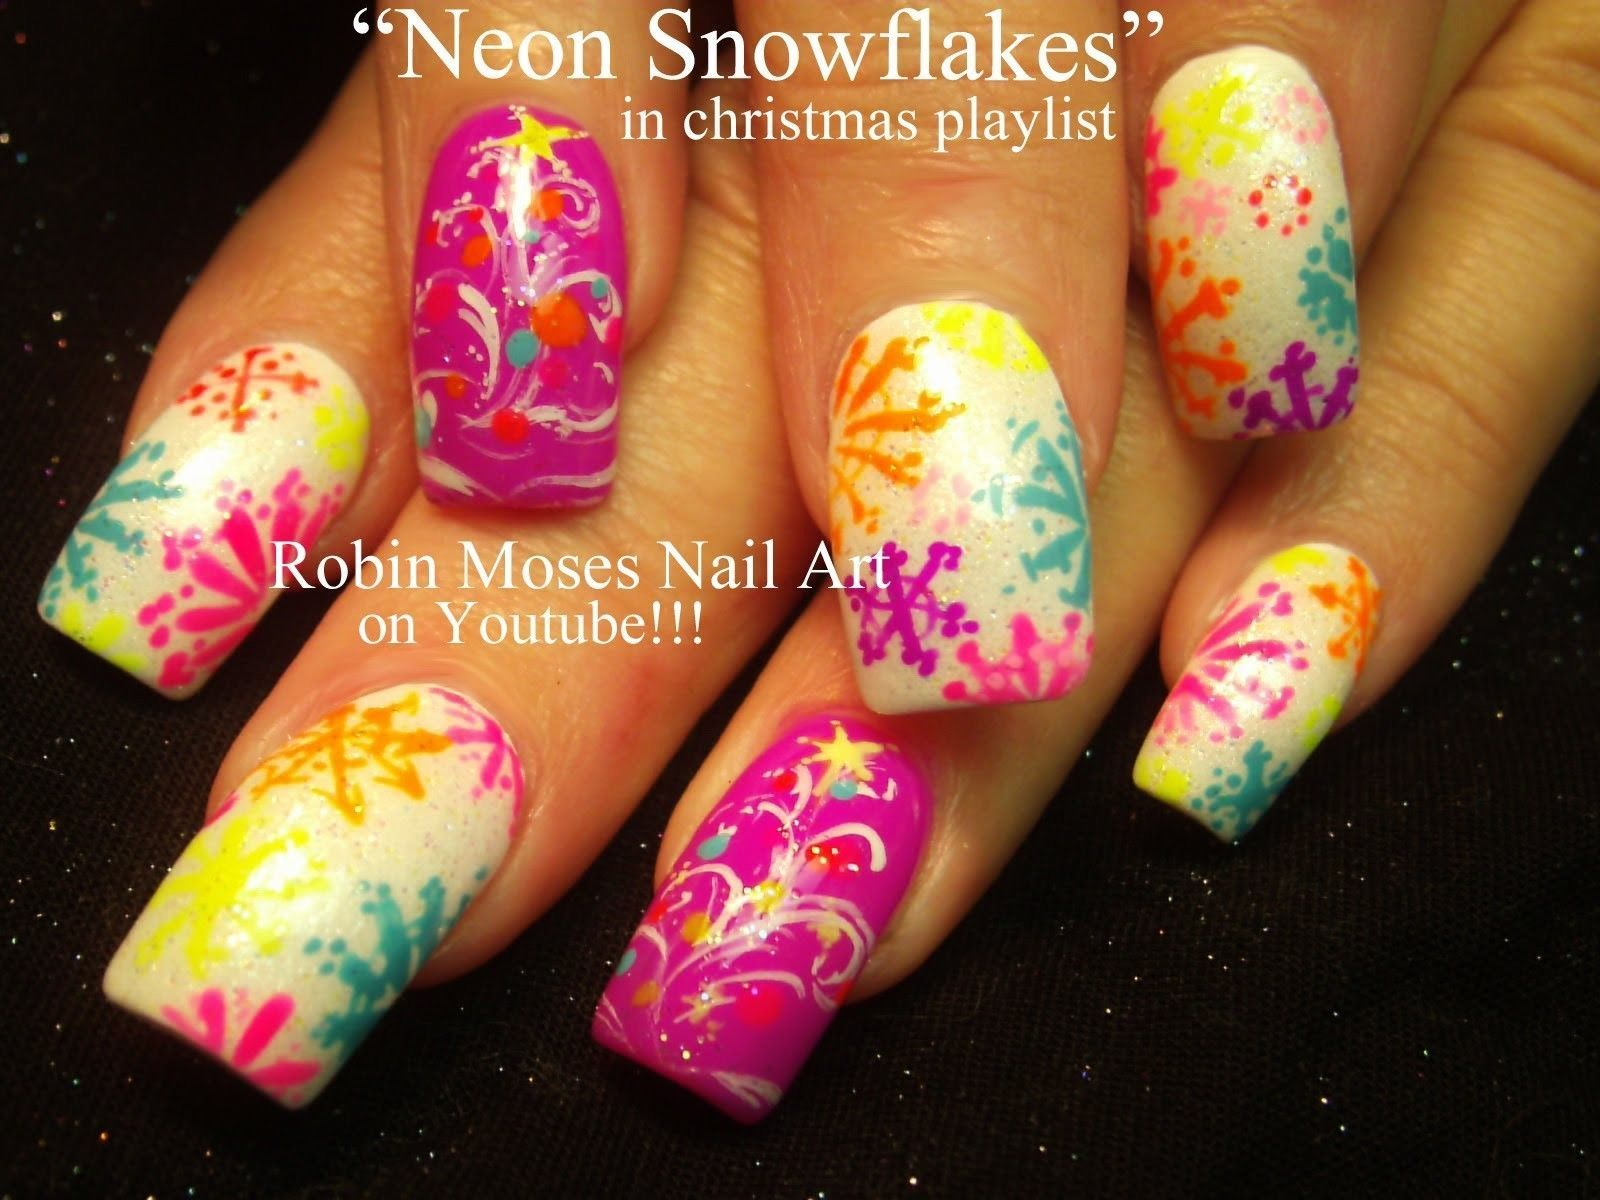 Nail Art Tutorial Diy Easy Christmas Nails Neon Snowflake Nails Xmas Trees Redchristmasnails Xmas Nail Art Snowflake Nail Art Skull Nail Art